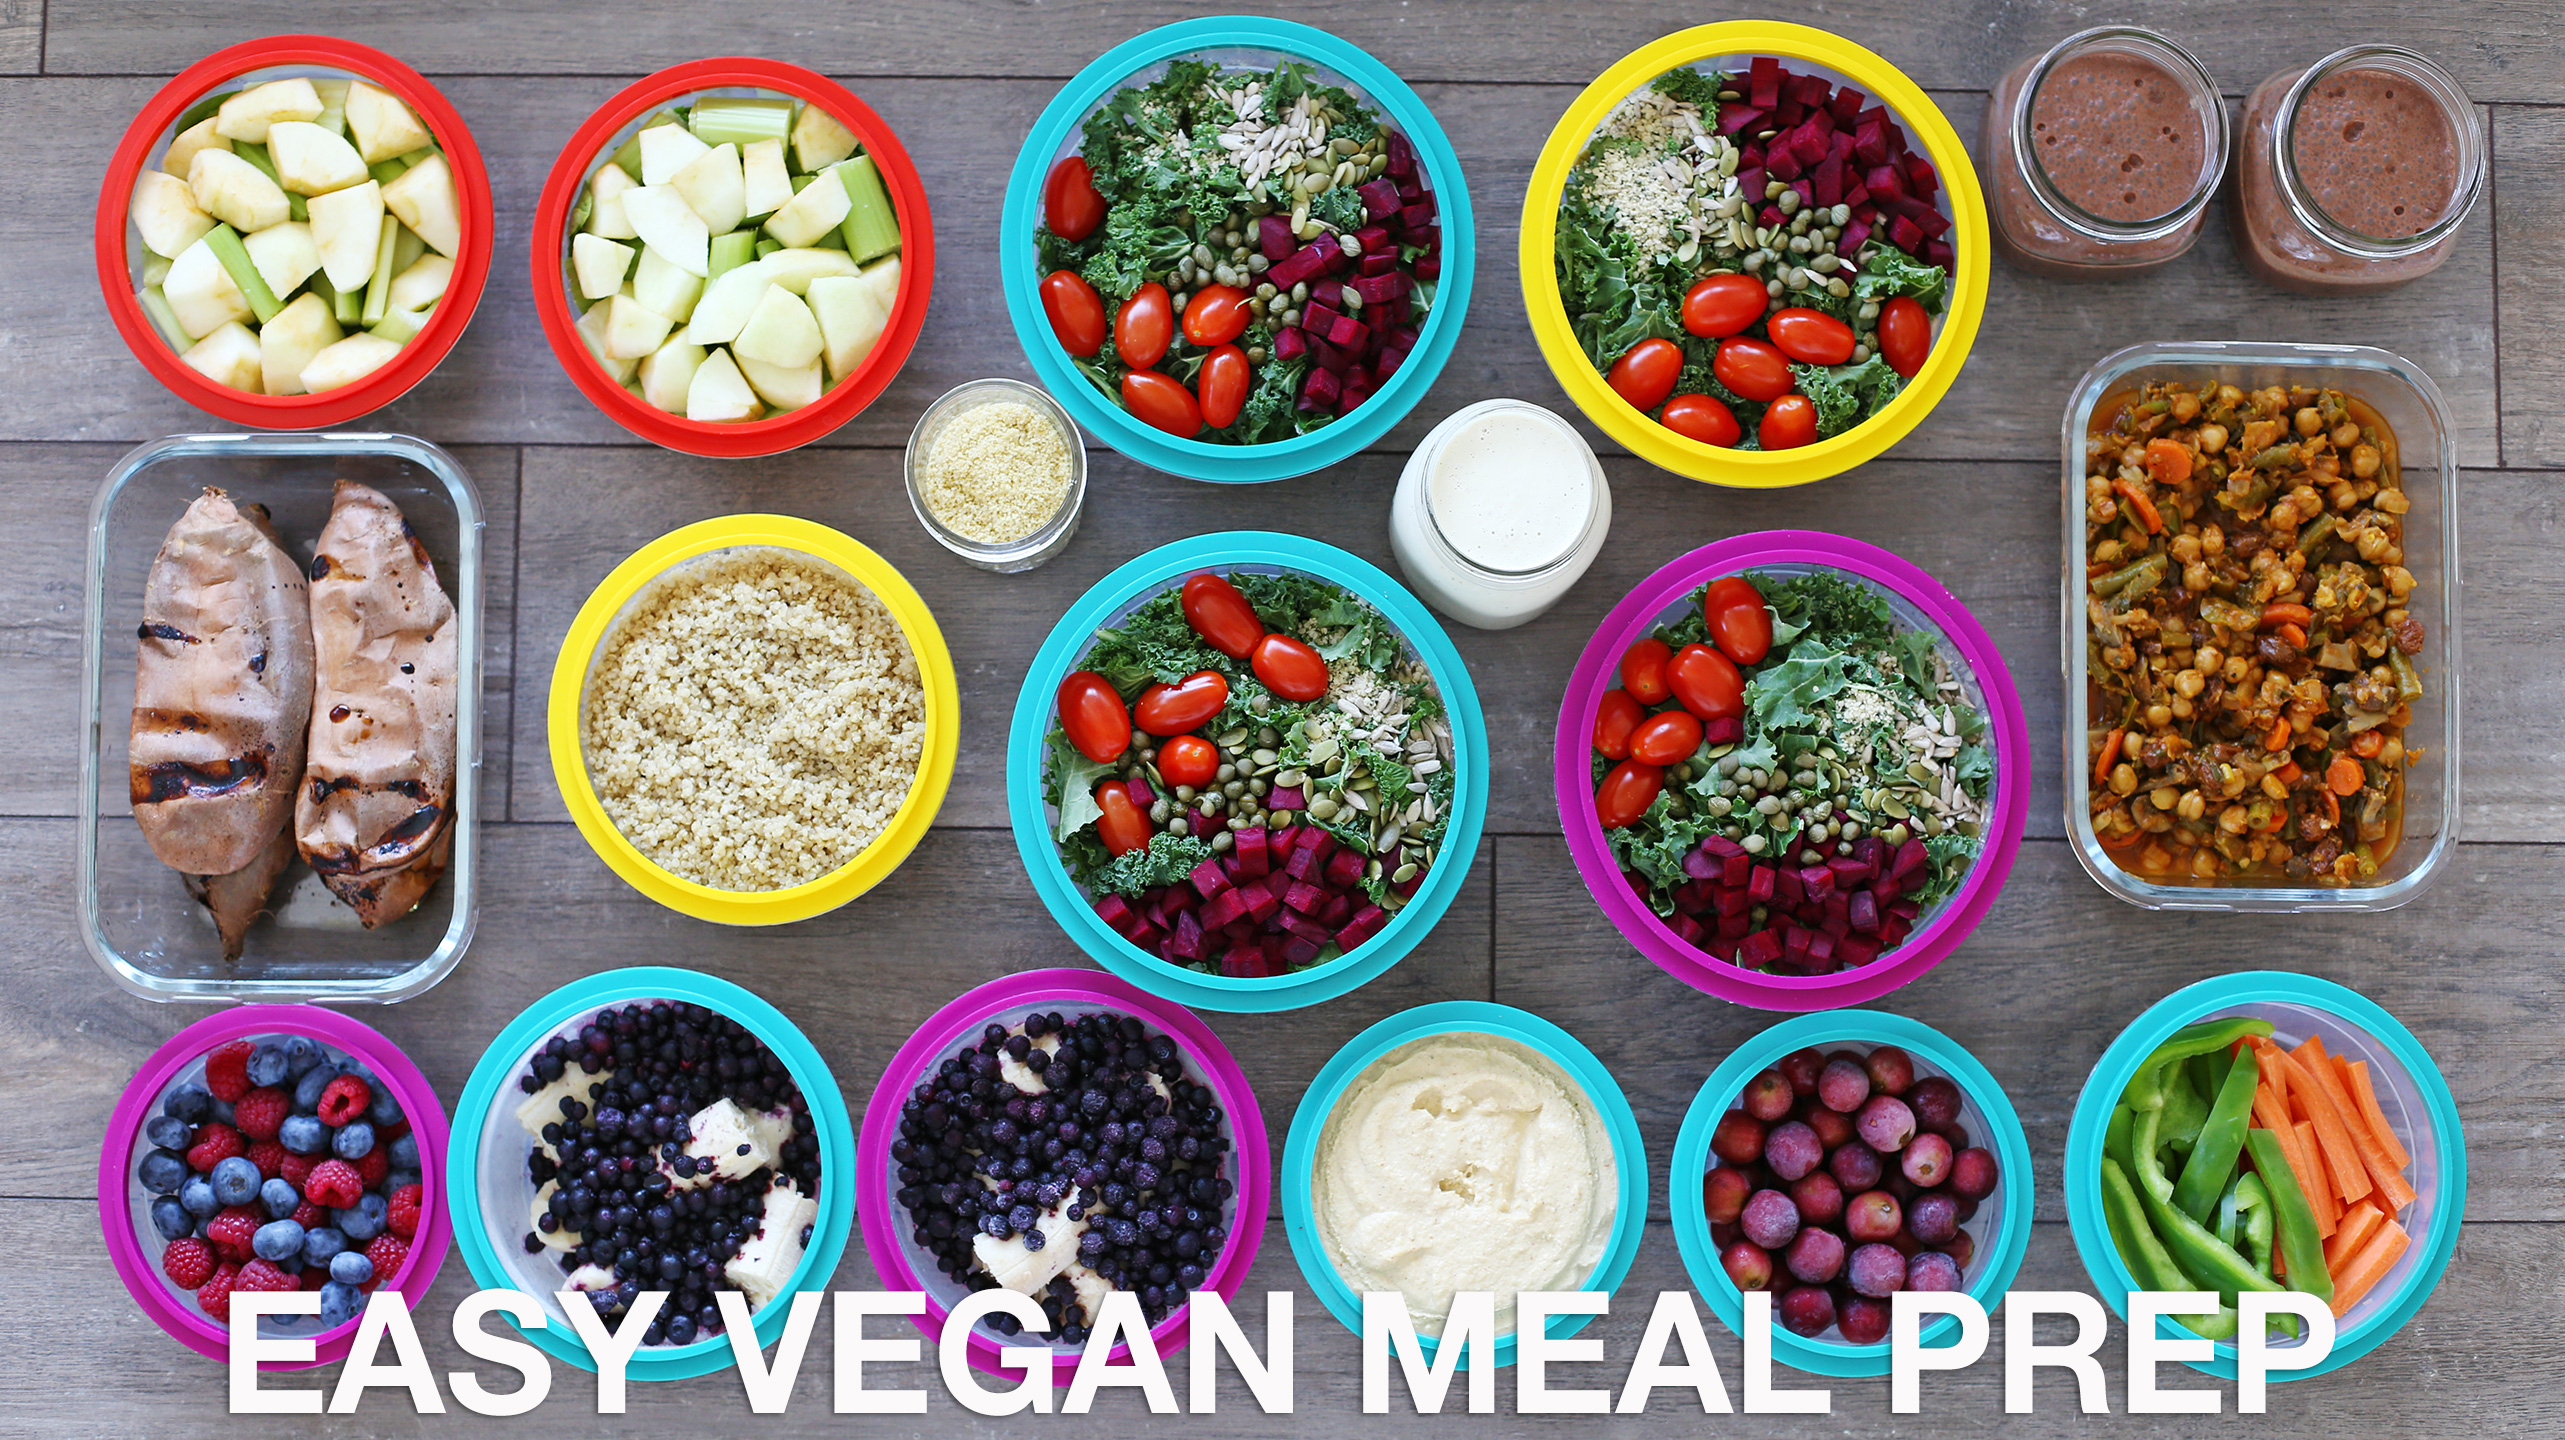 Super Easy Vegan Meal Prep | 12 Healthy Meals + Snacks - Fablunch &QX44